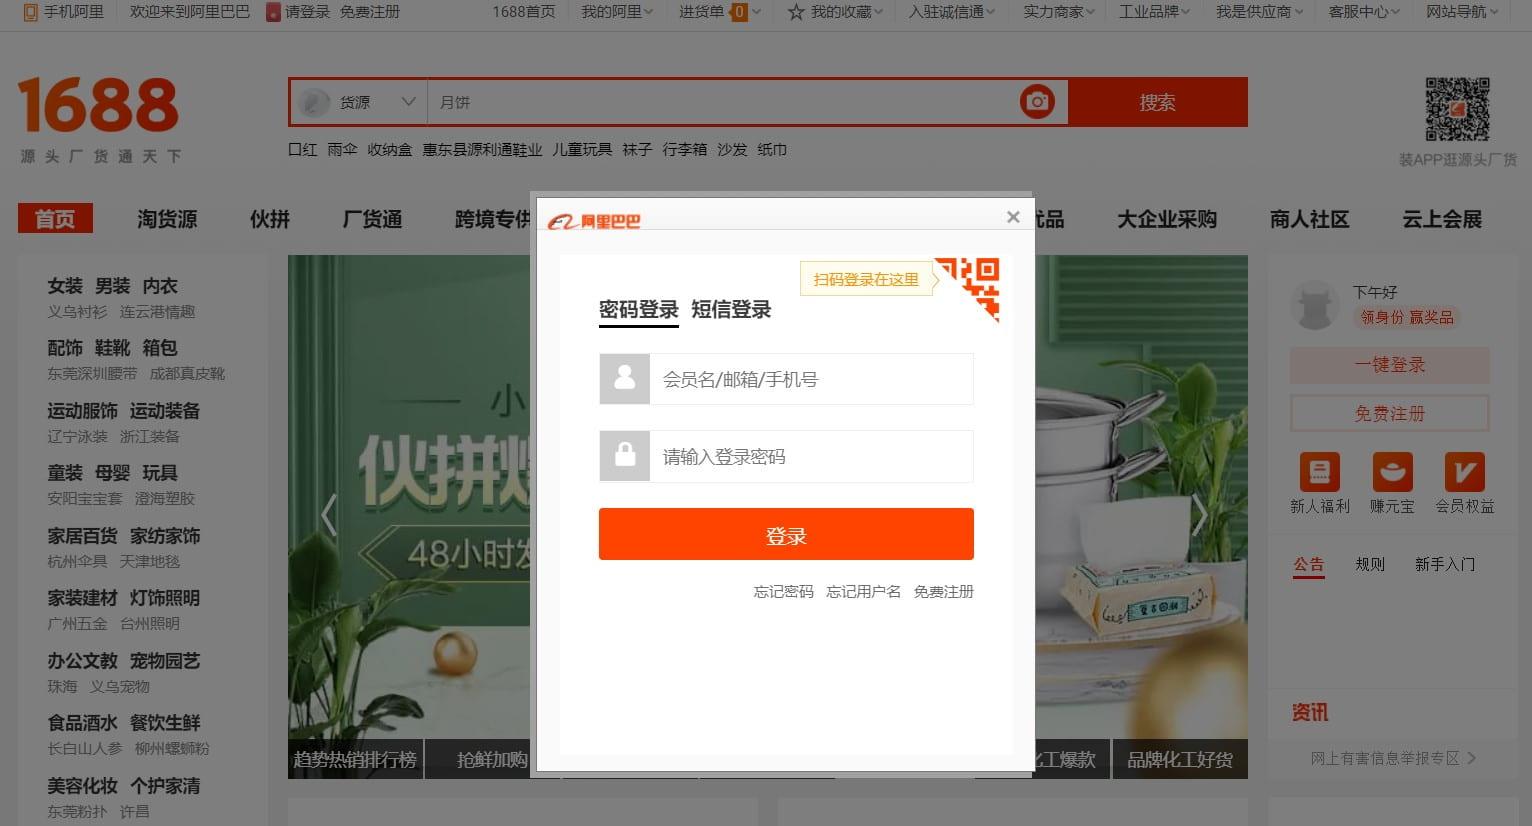 login 1688.com alibaba